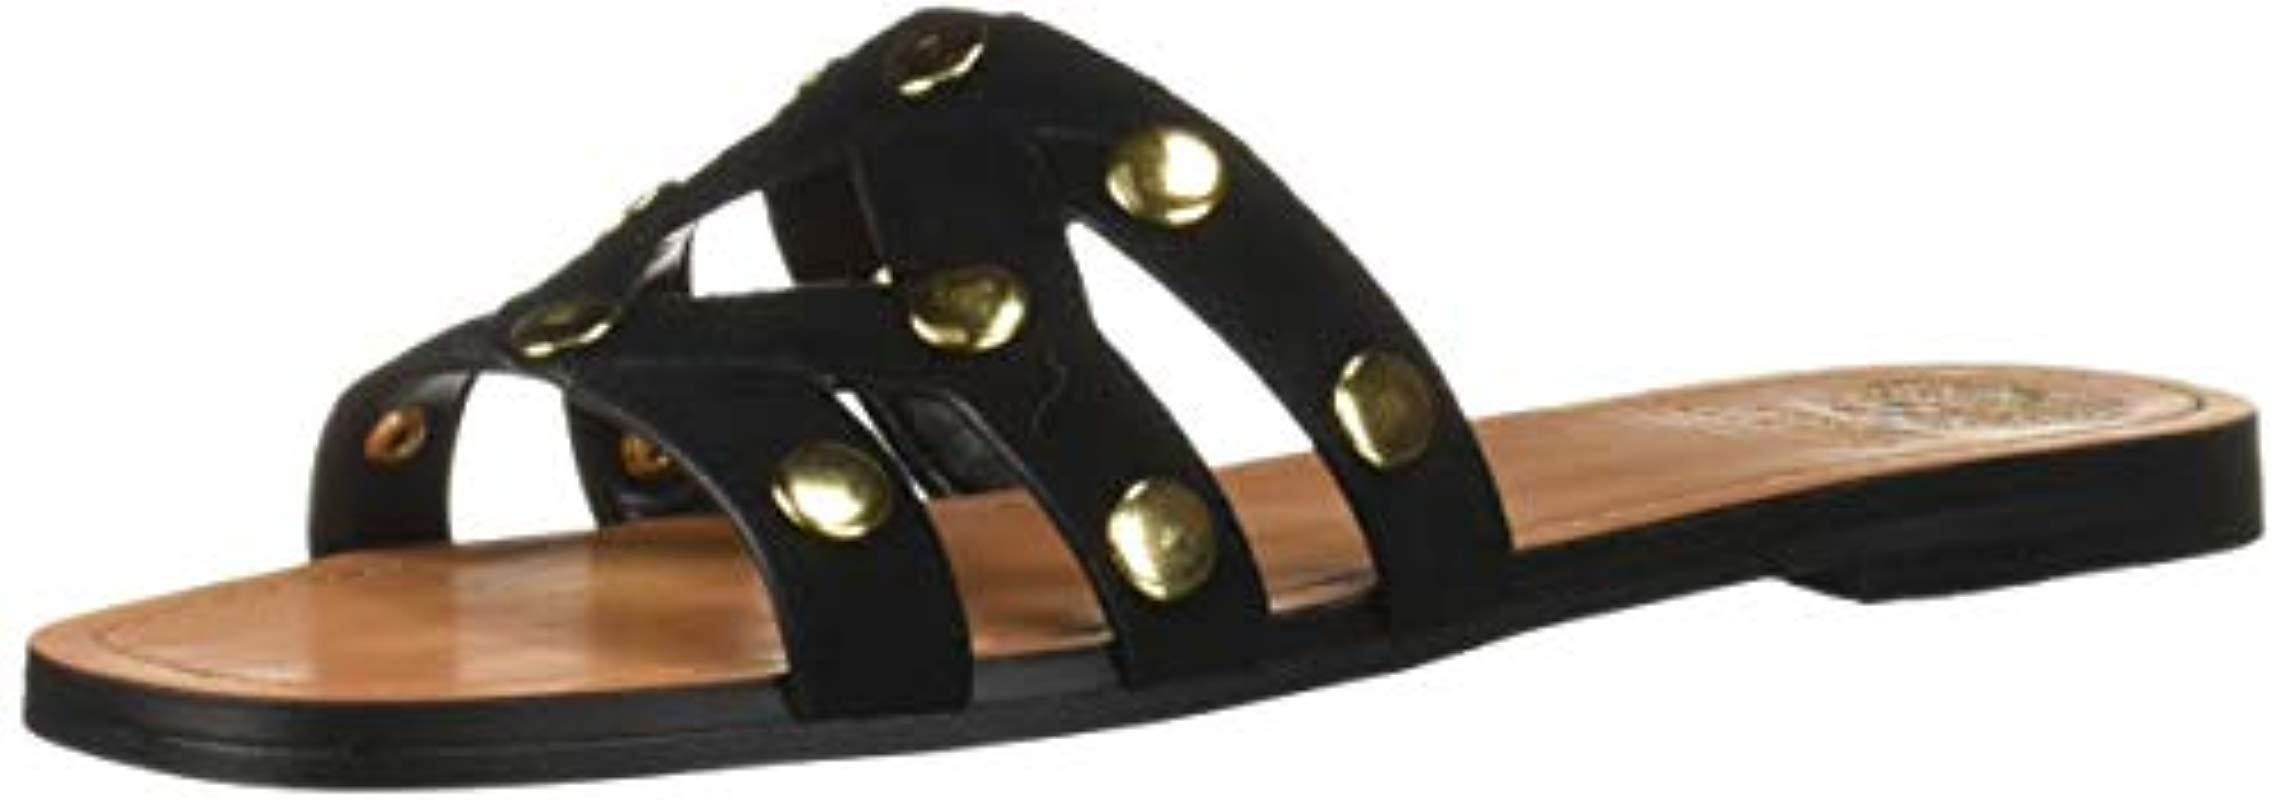 3f2b507de09f Lyst - Vince Camuto Vazista Slide Sandal in Black